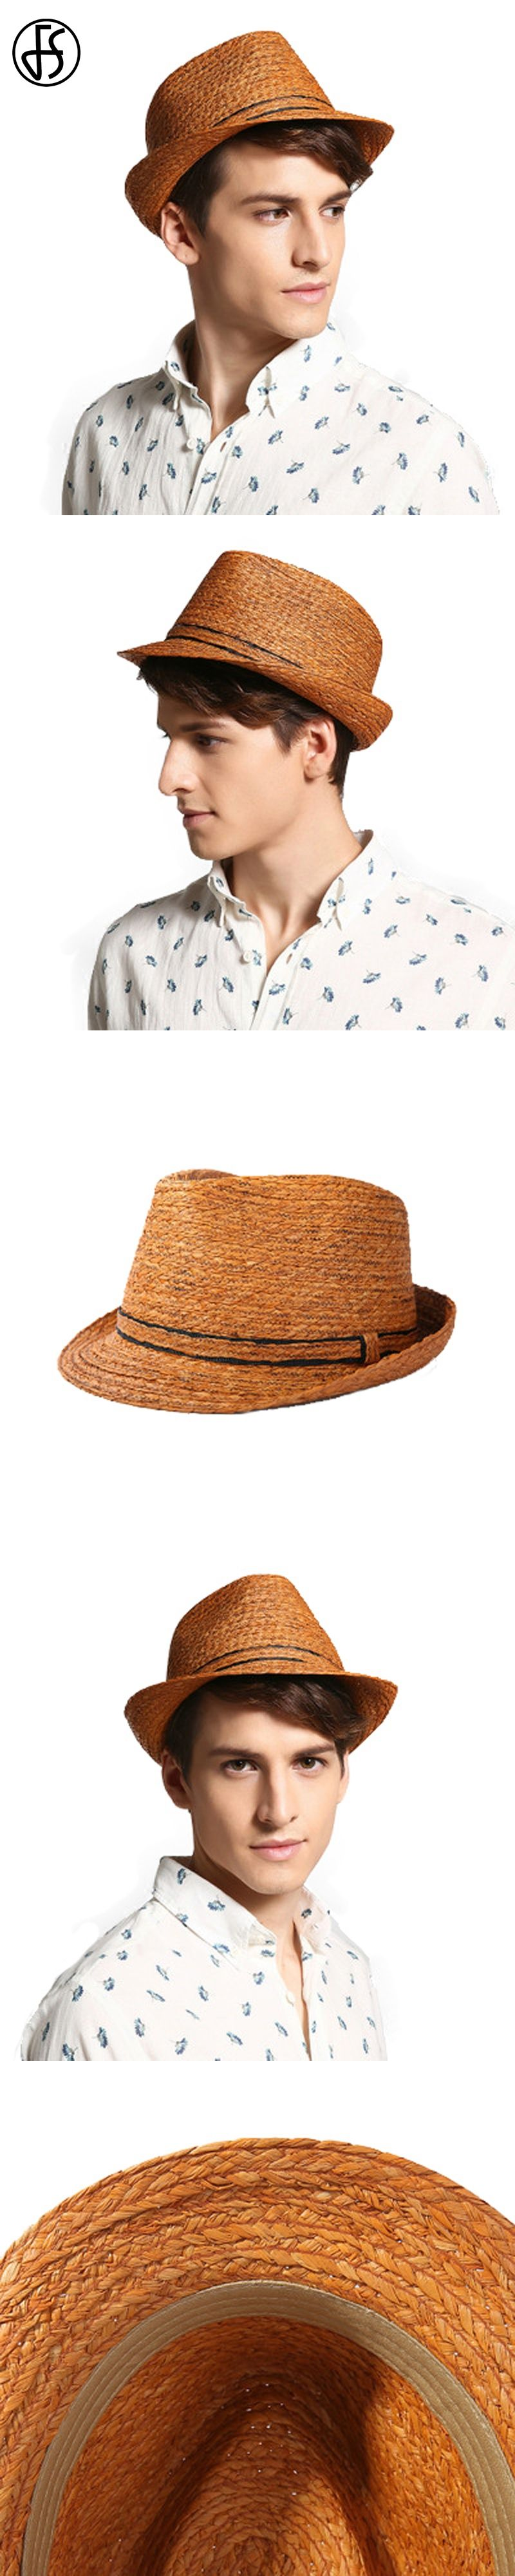 2d9b782d003 FS Vintage Panama Hat Men Raffia Straw Fedora For Male Women Summer Fashion  Beach Sun Visor